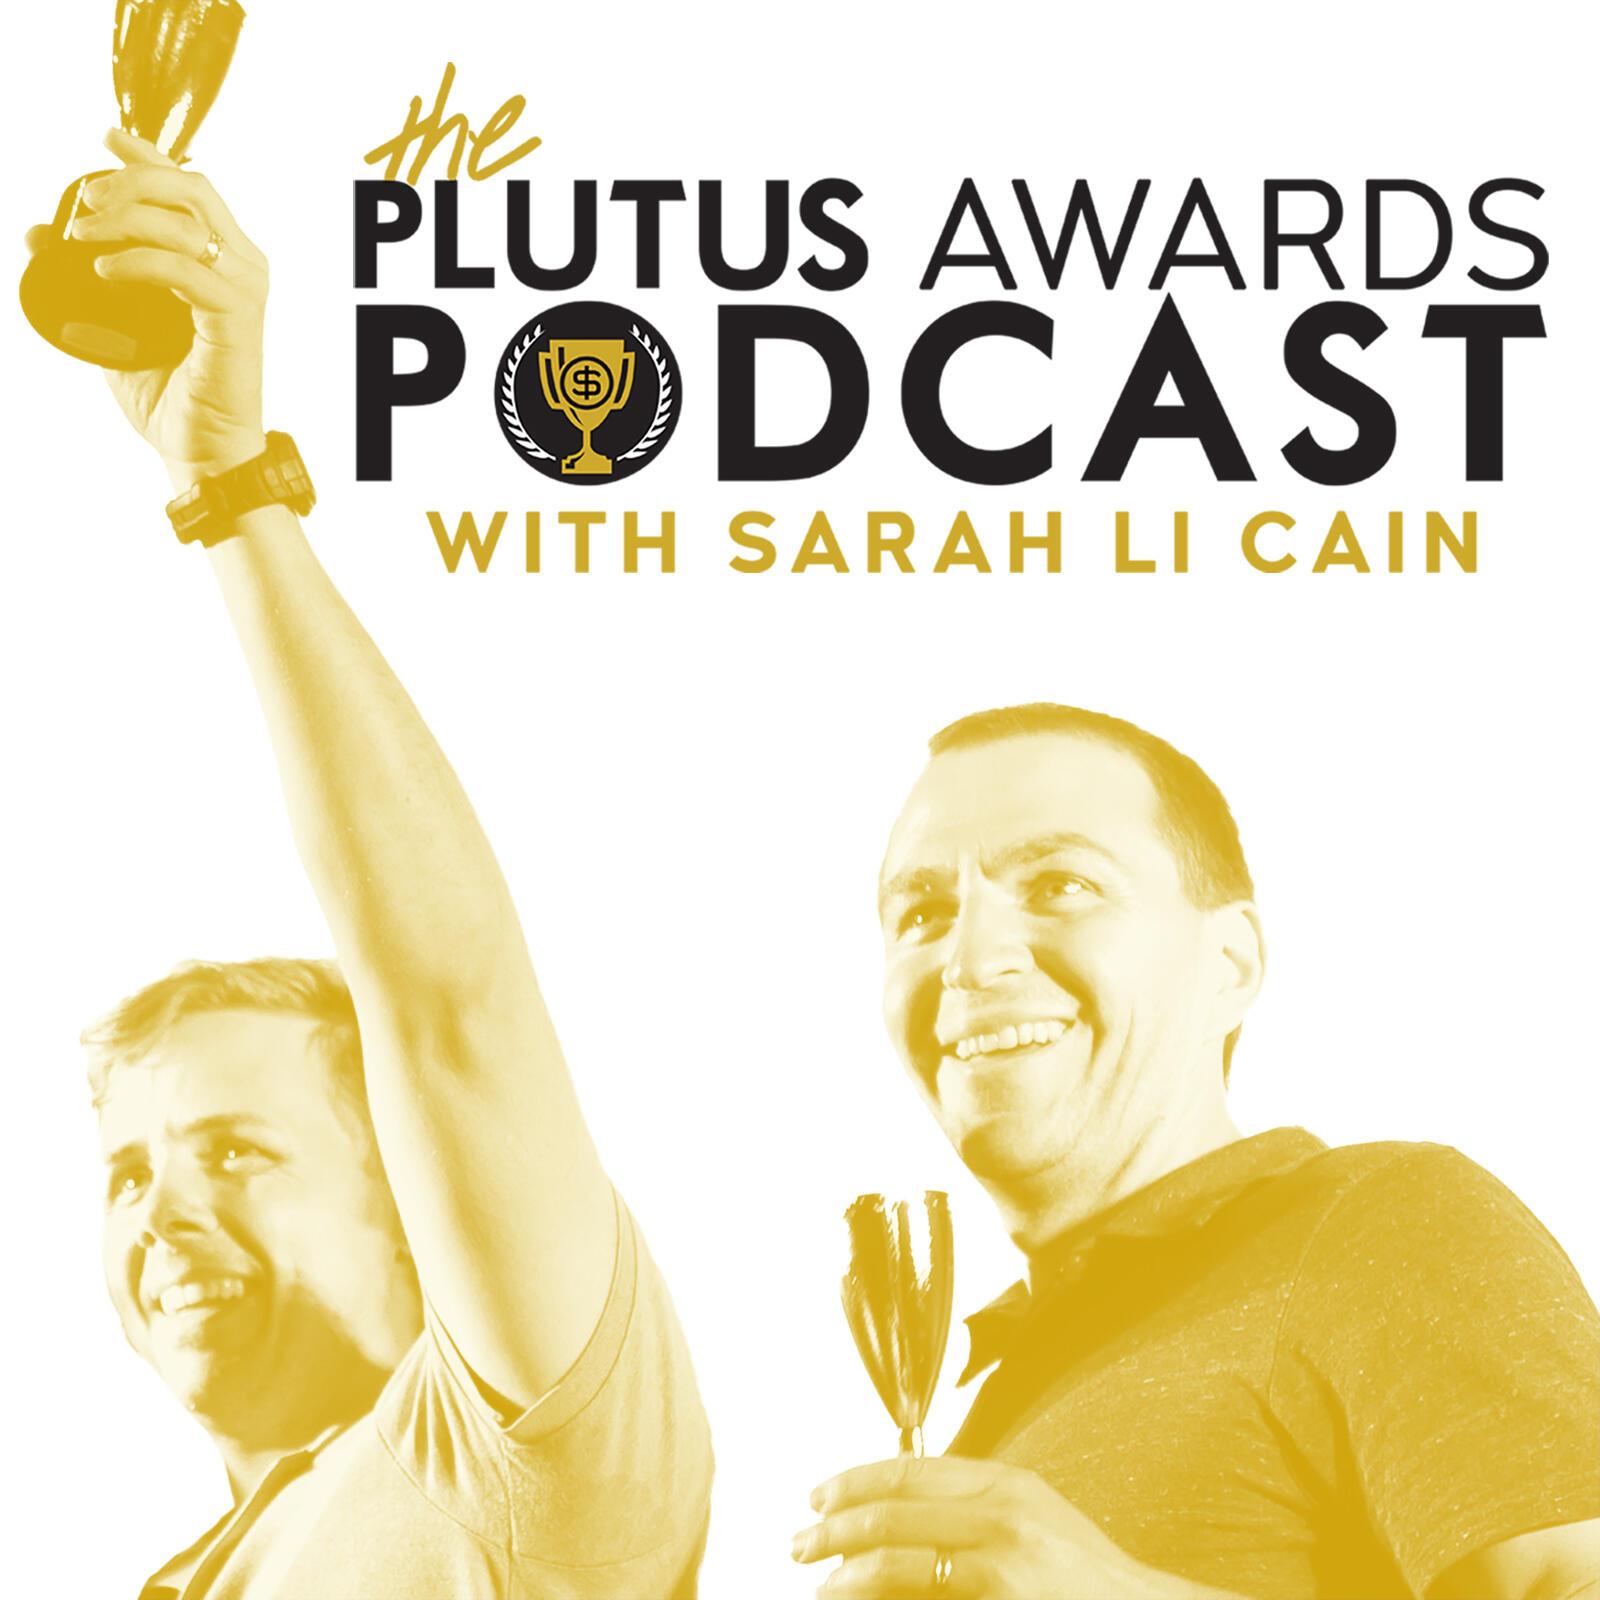 Plutus Awards Podcast